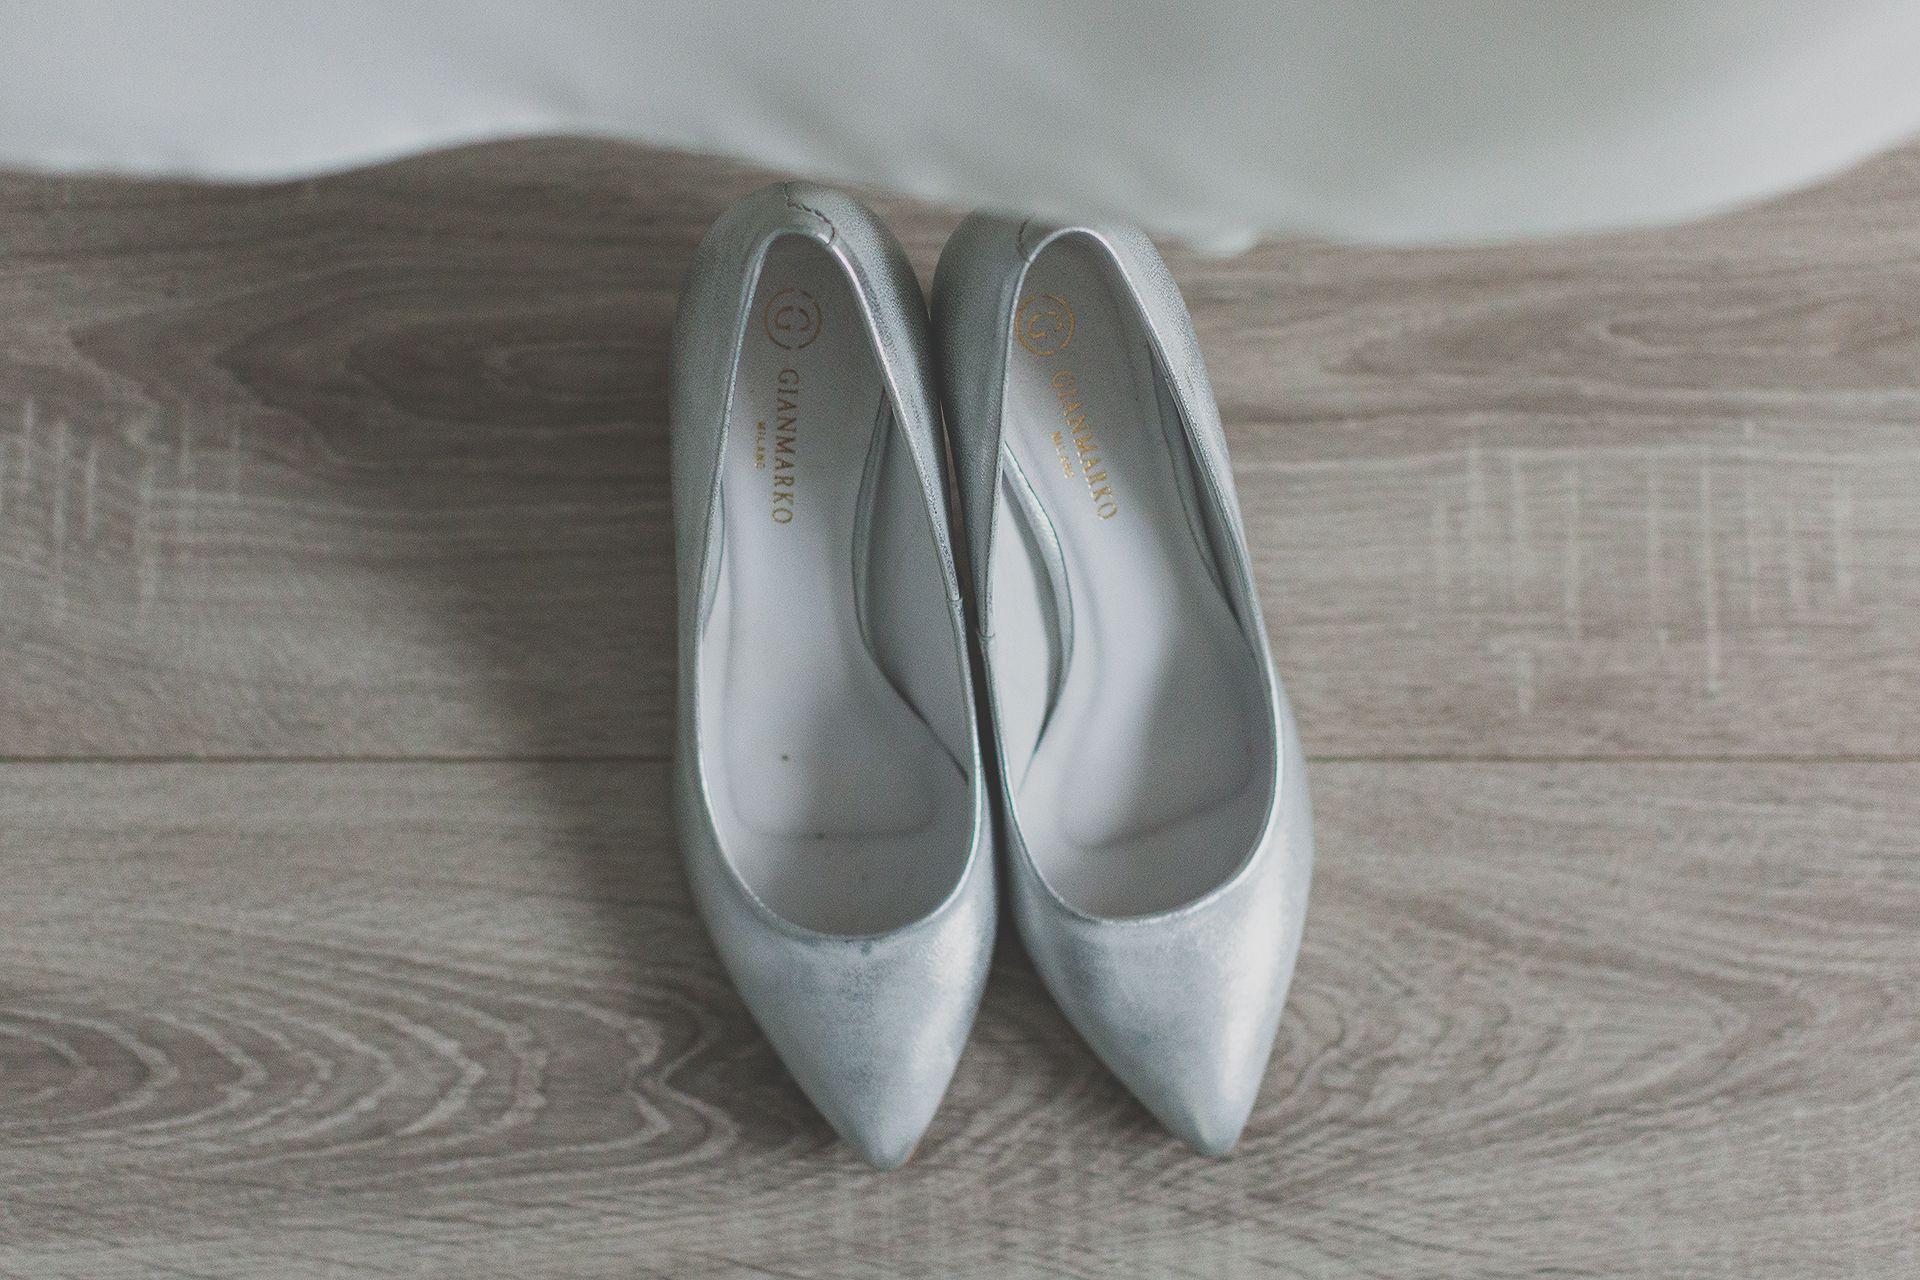 Buty ślubne pani młodej